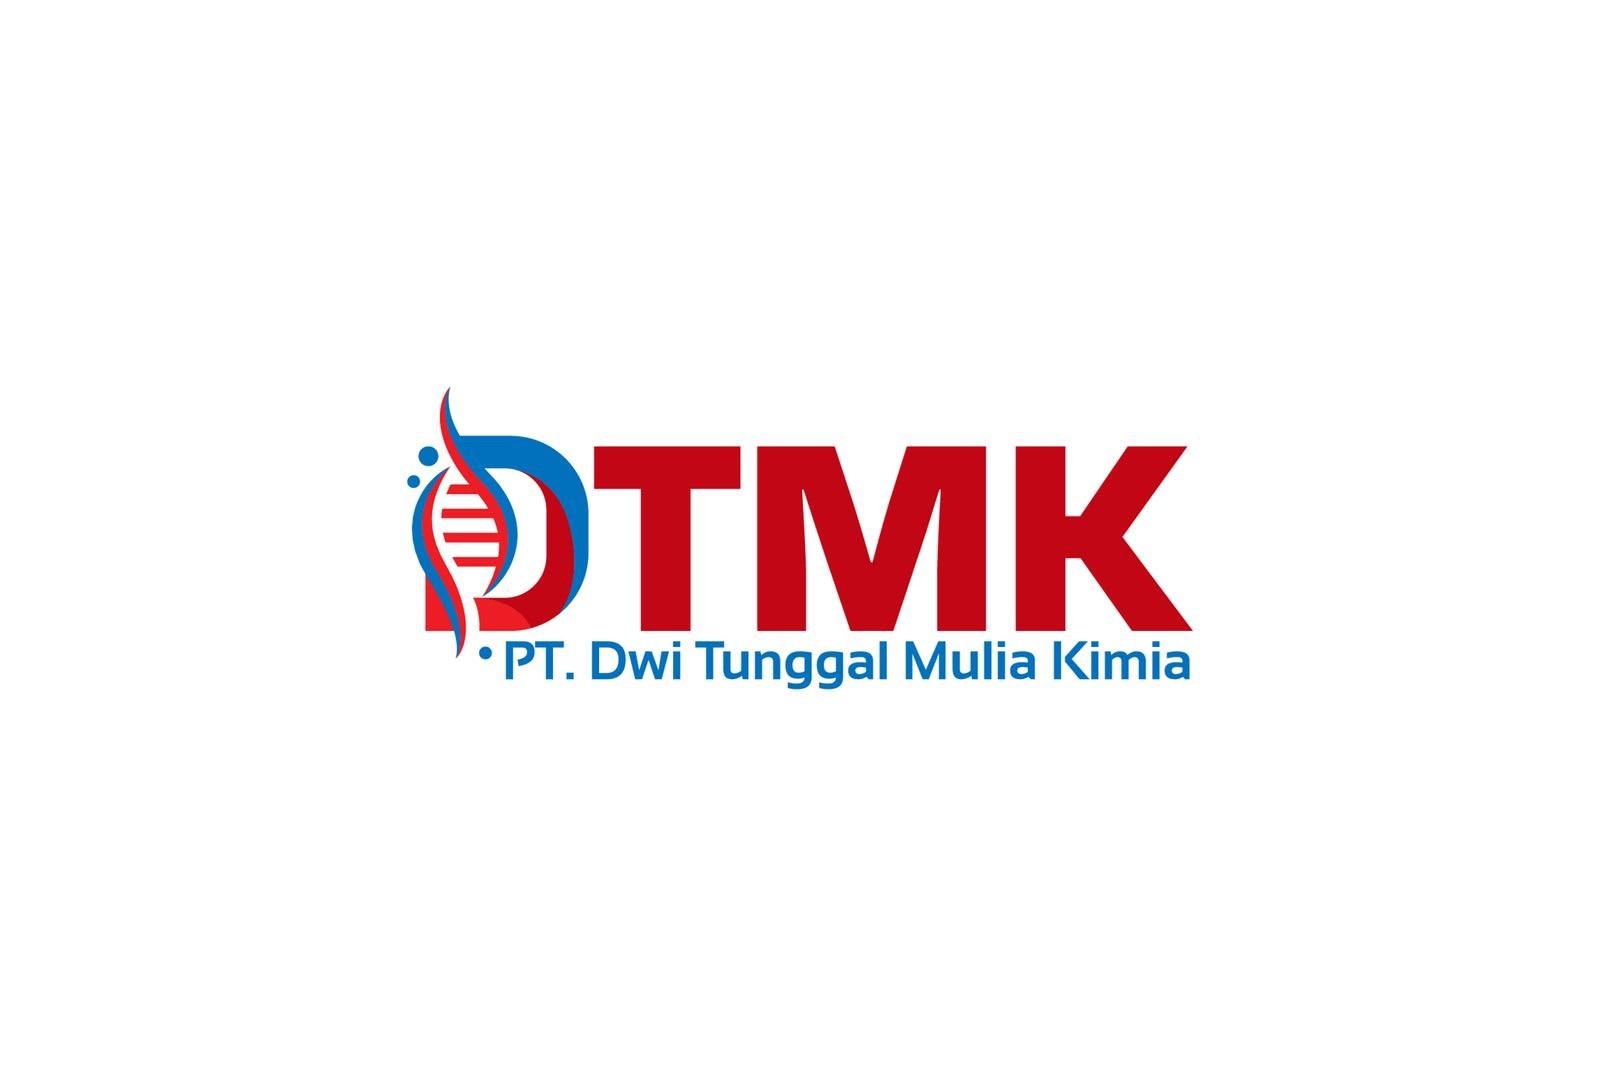 Logo PT. Dwi Tunggal Mulia Kimia